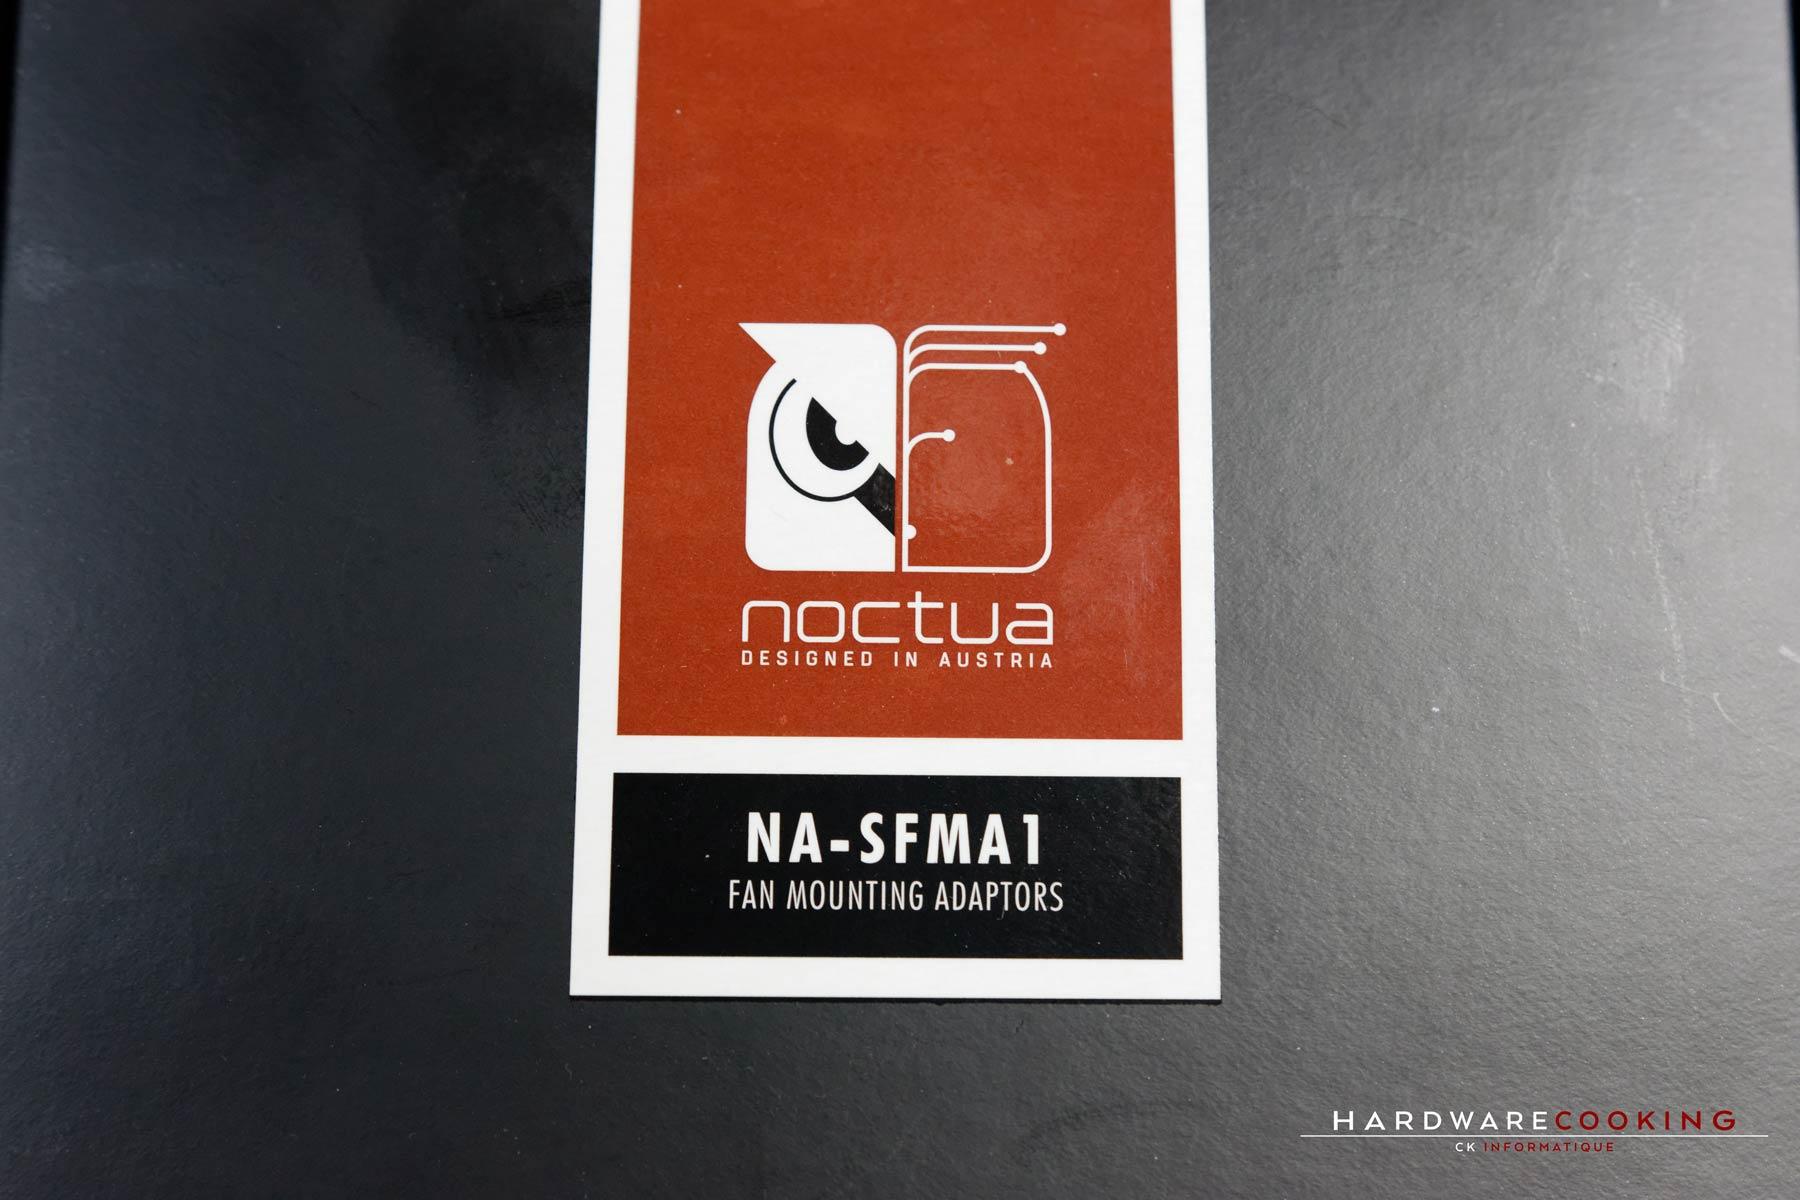 Test cadre Noctua NA-SFMA1